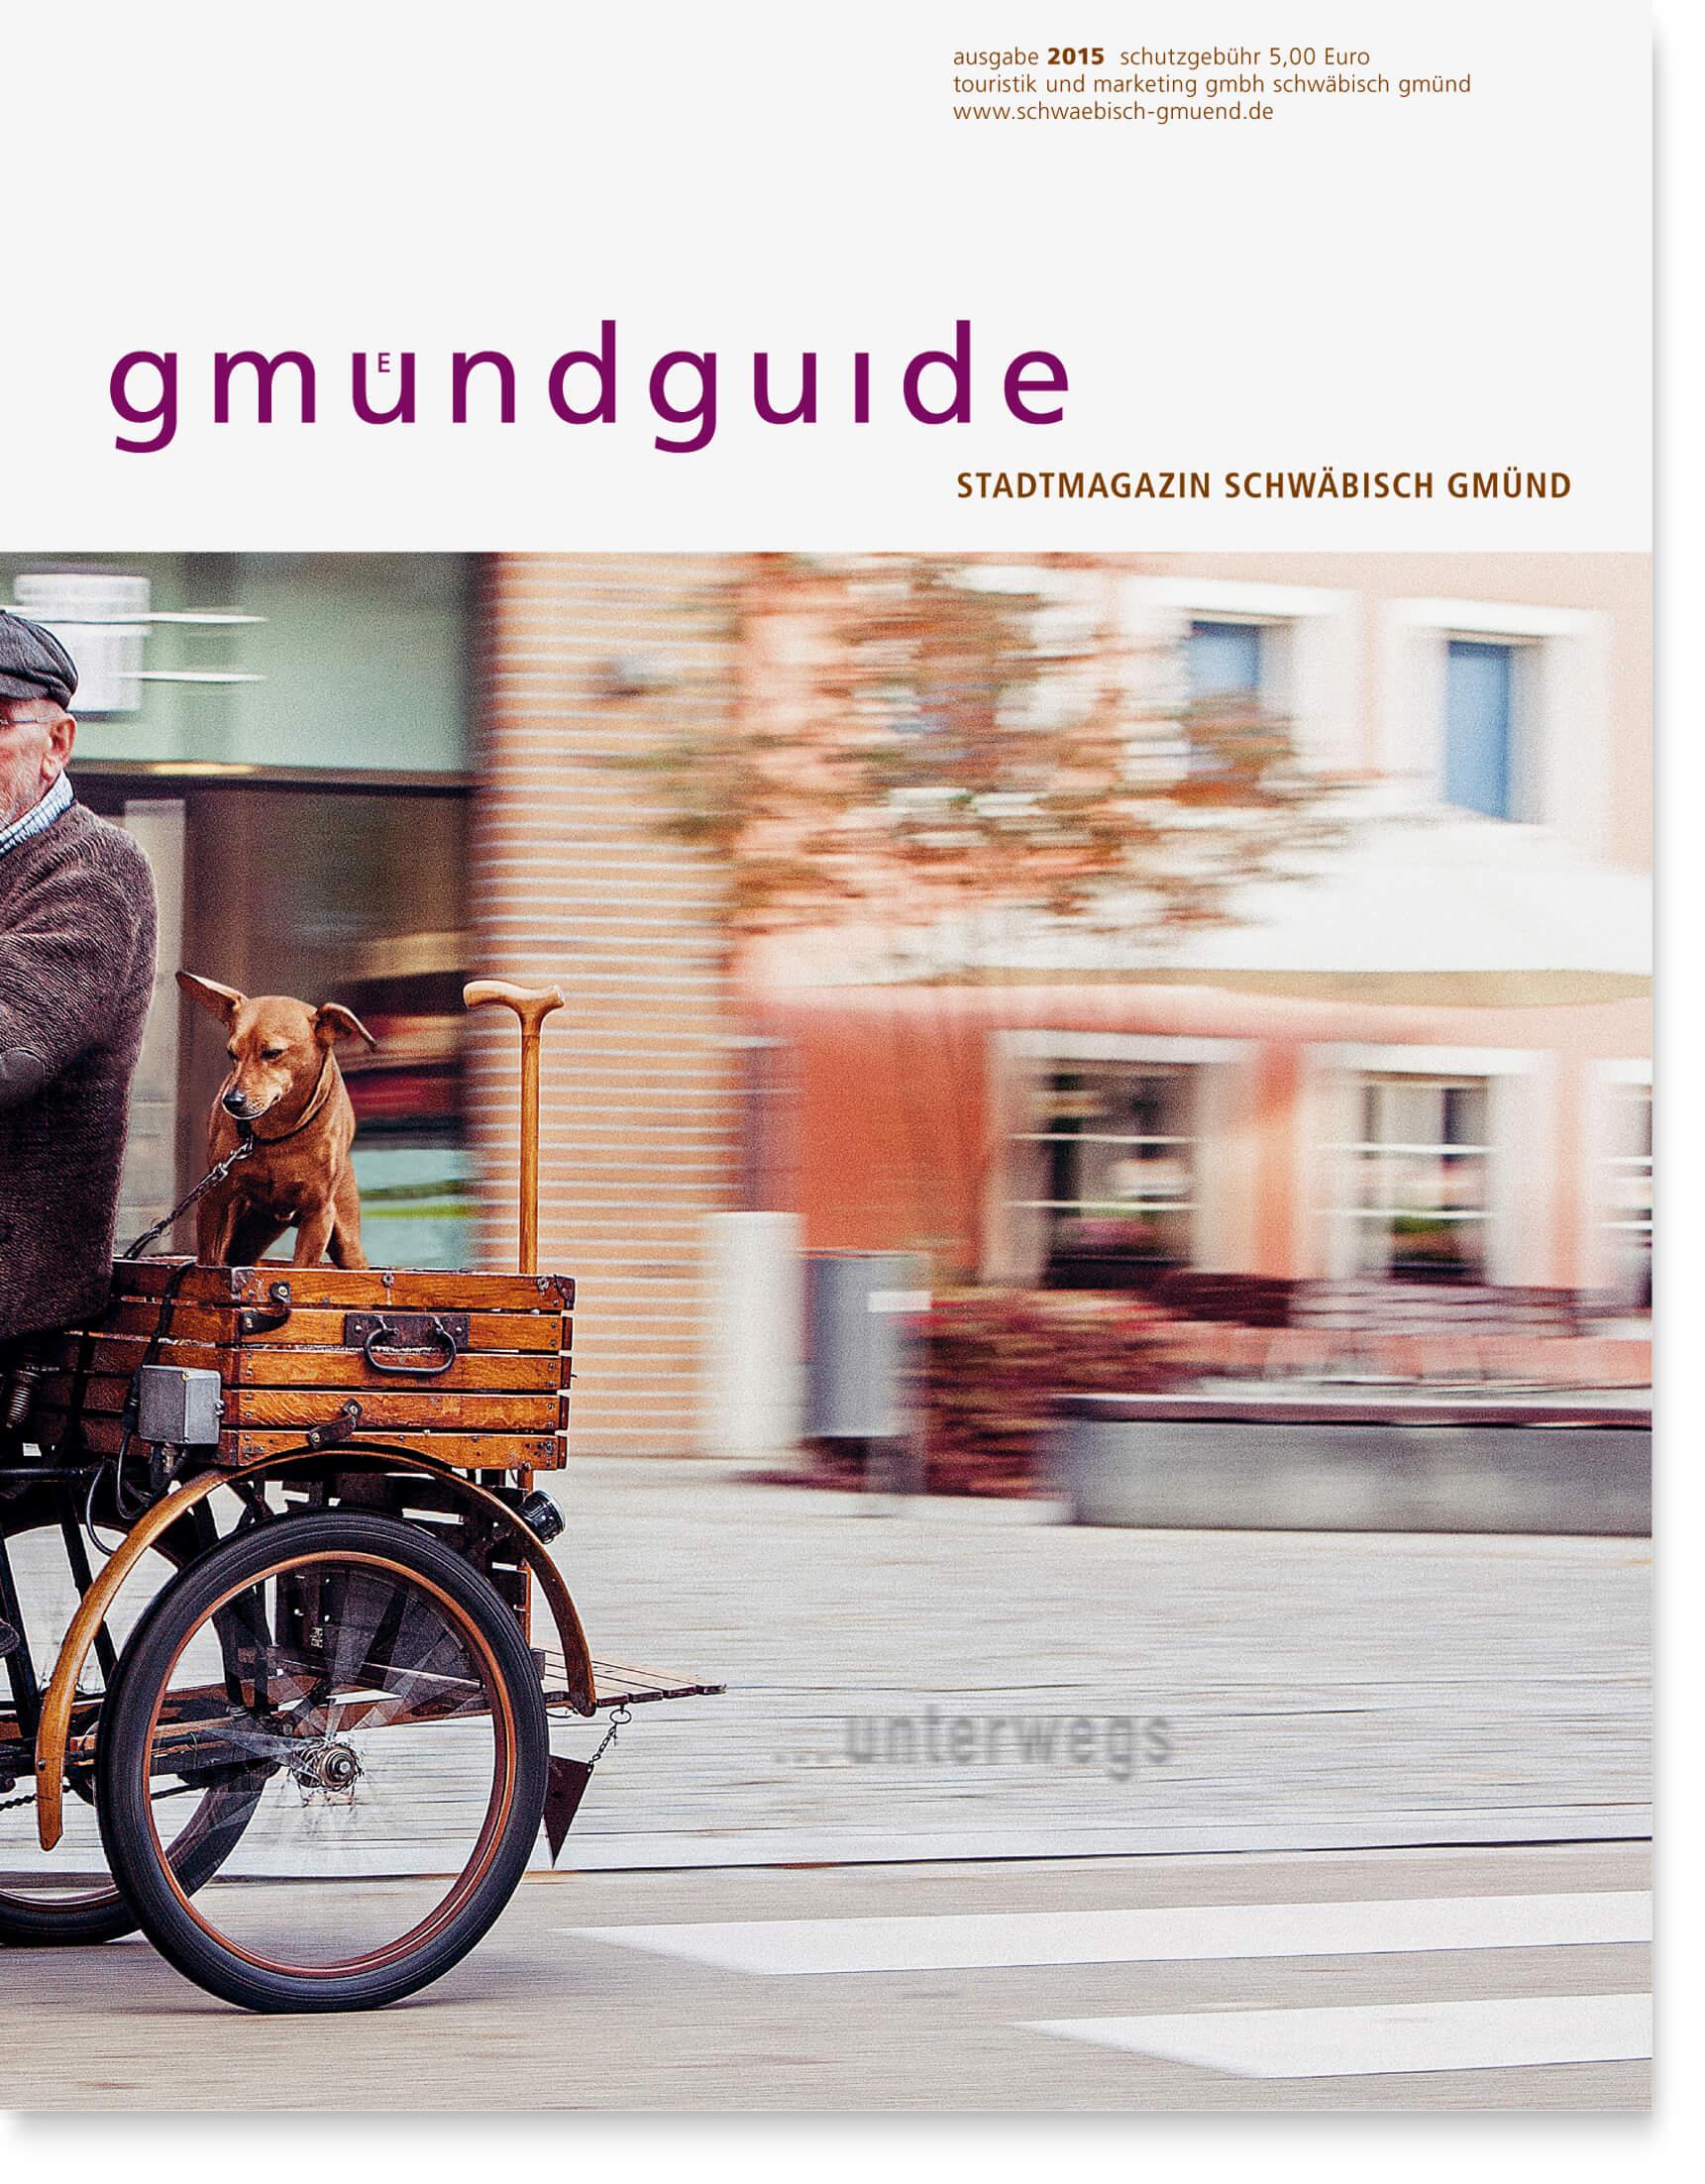 fh-web-gmuendguide-2015-1.jpg